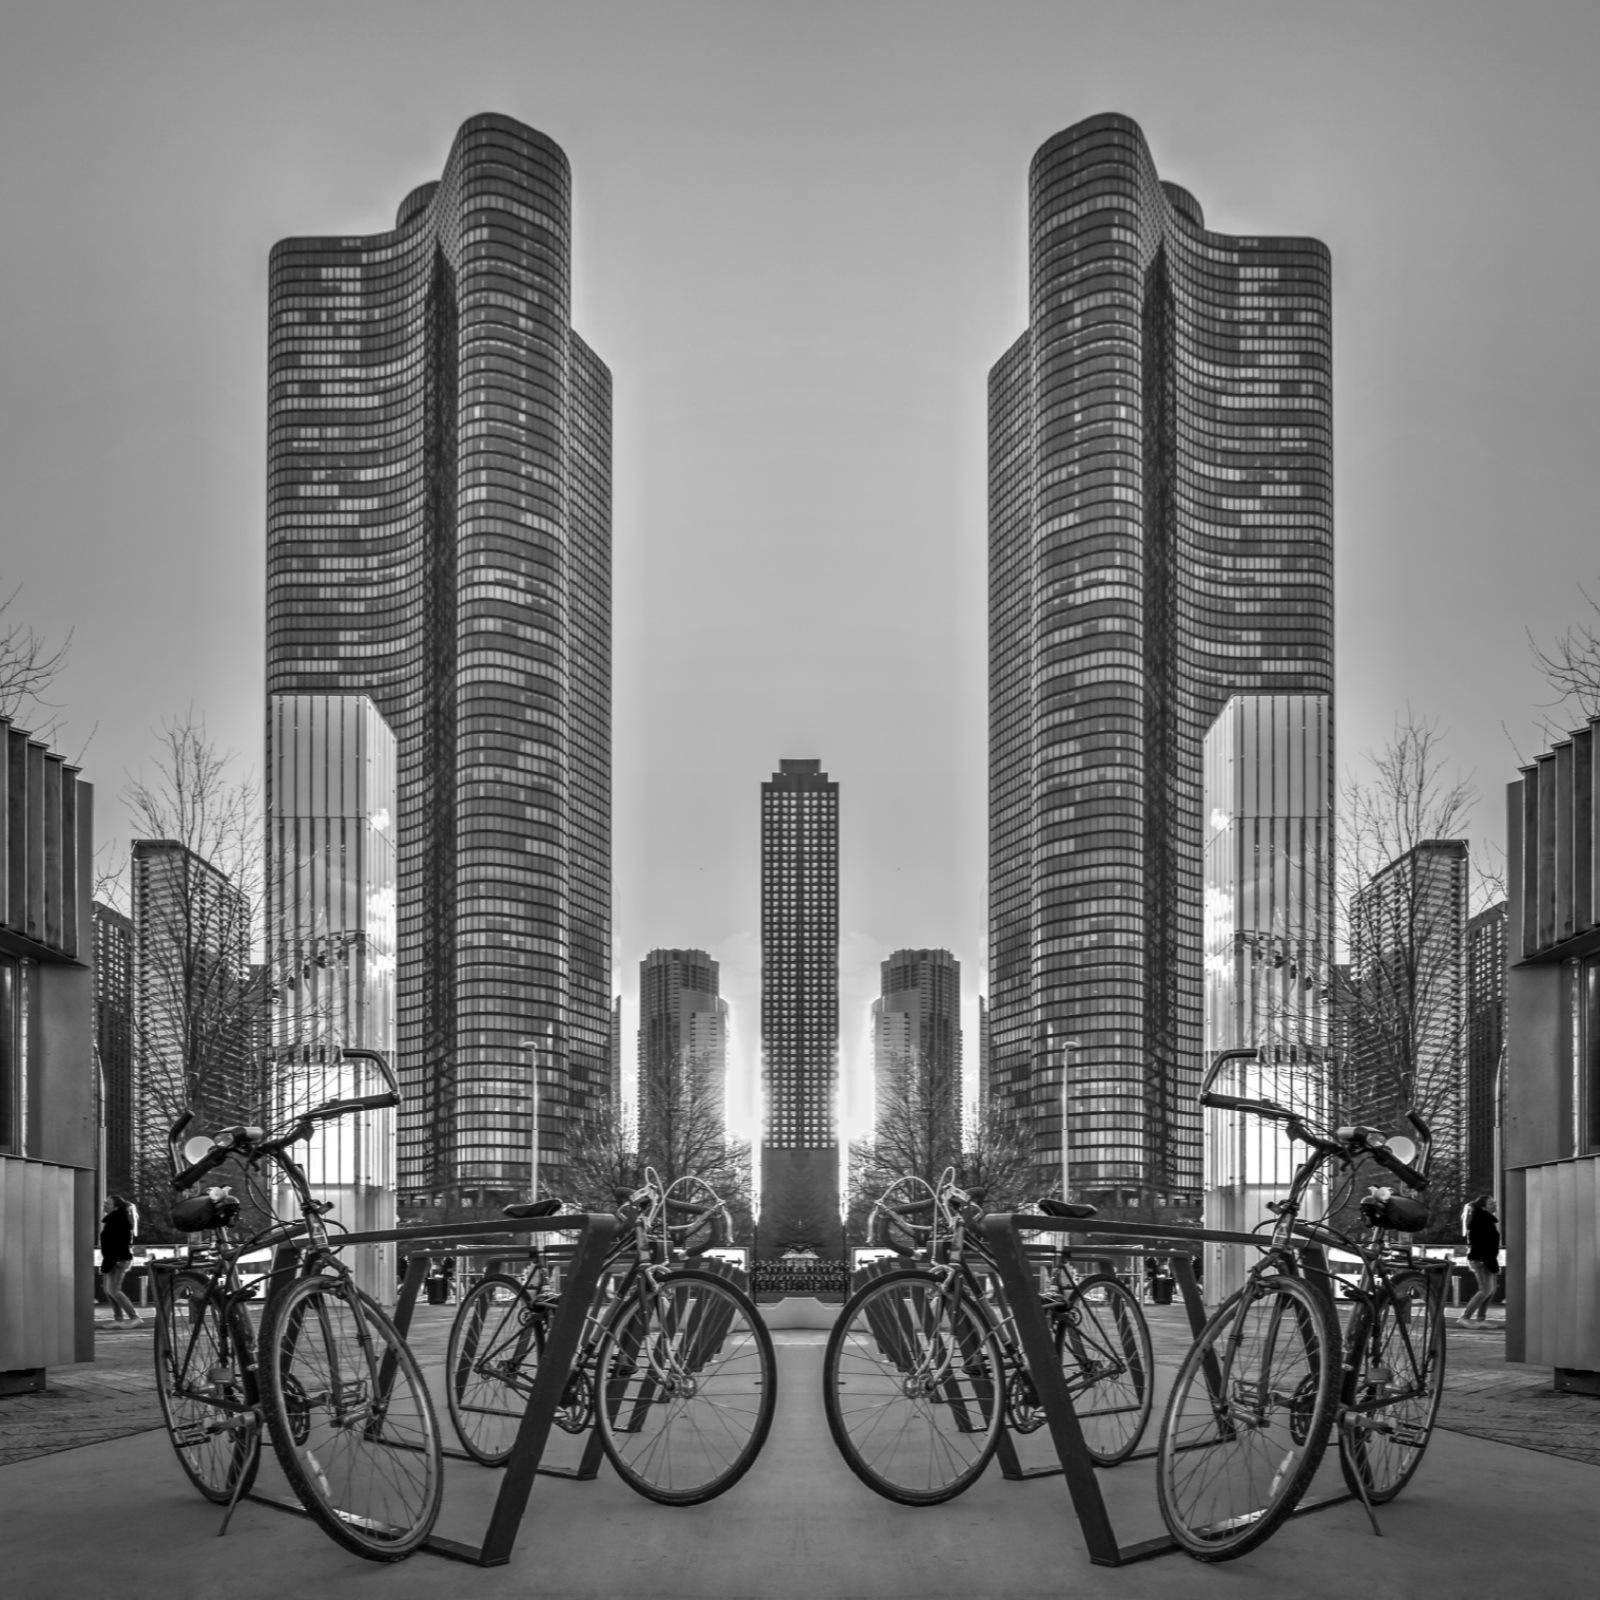 #bicycles #citybike #black_white #blackandwhite by Haytham Alhefnawy